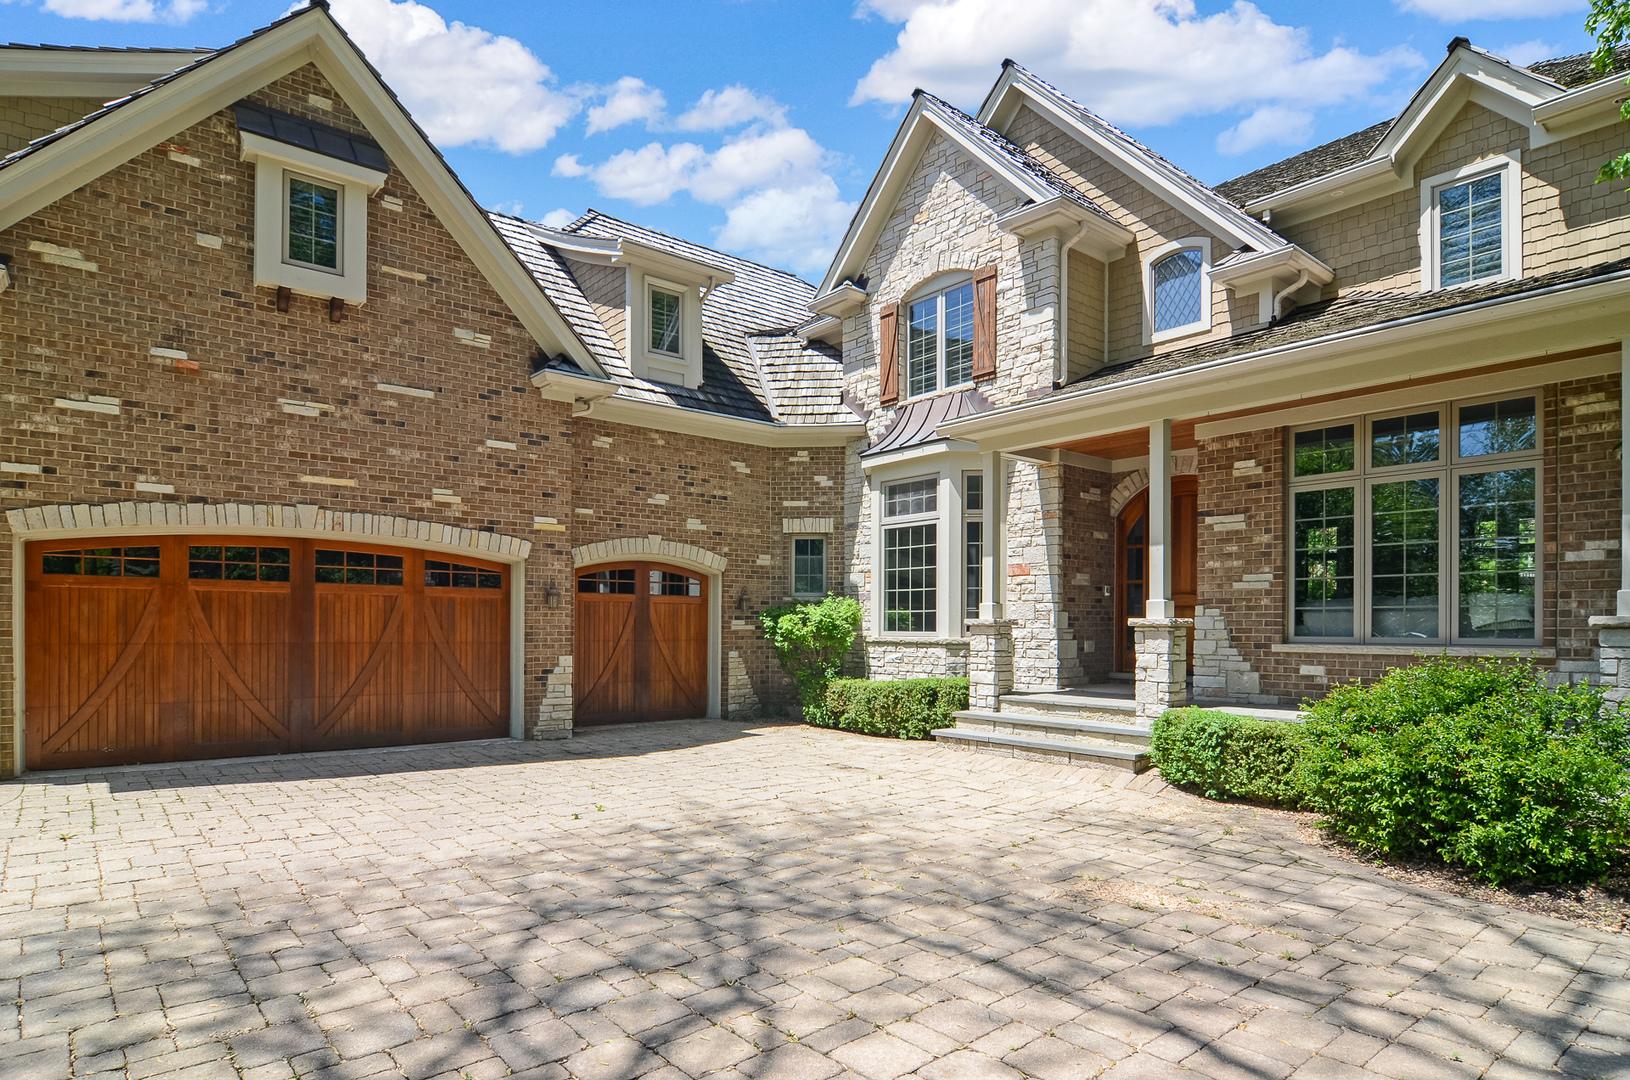 348 Harris, CLARENDON HILLS, Illinois, 60514